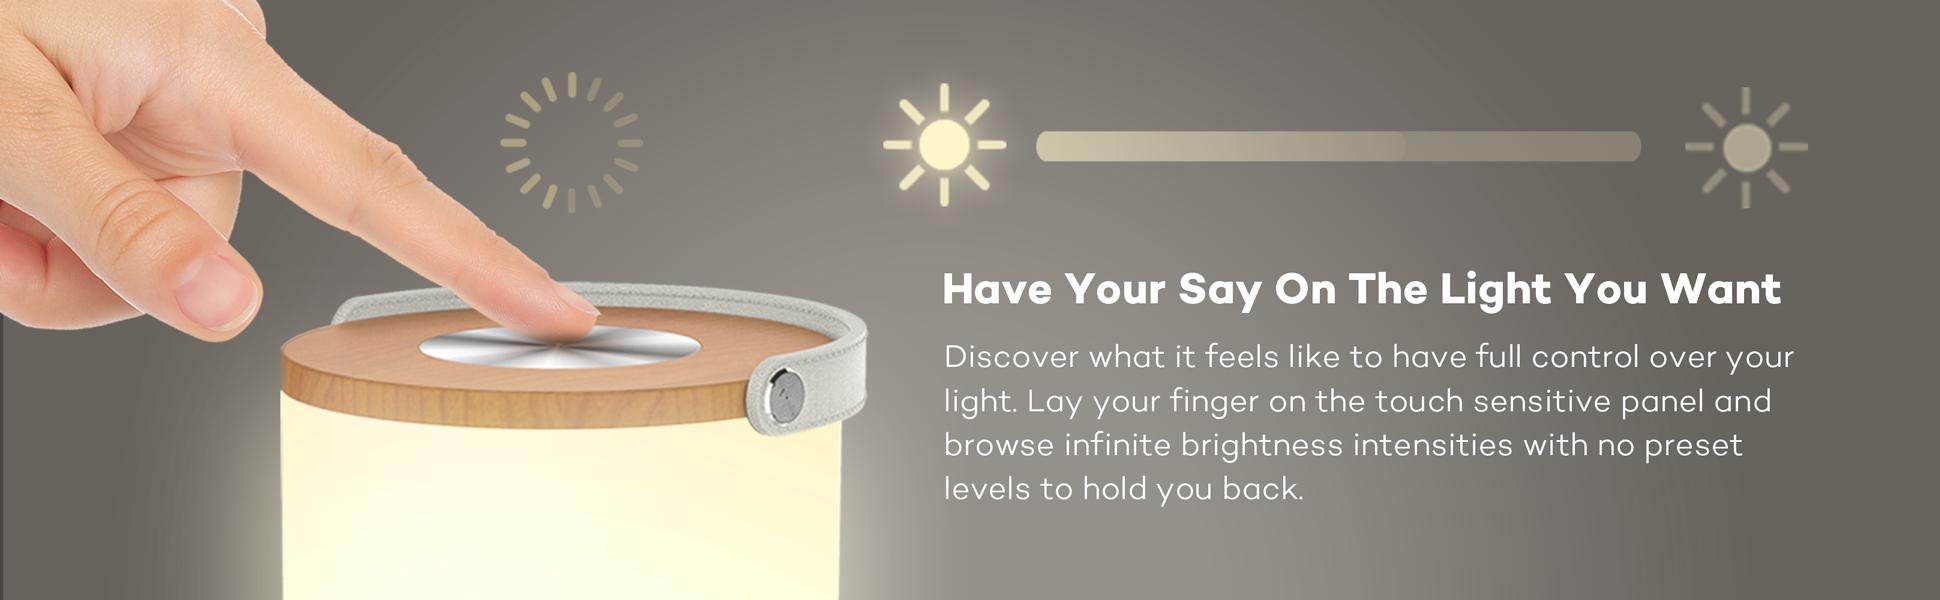 Taotronics Rechargeable Touch Sensor Bedside Lamp Led